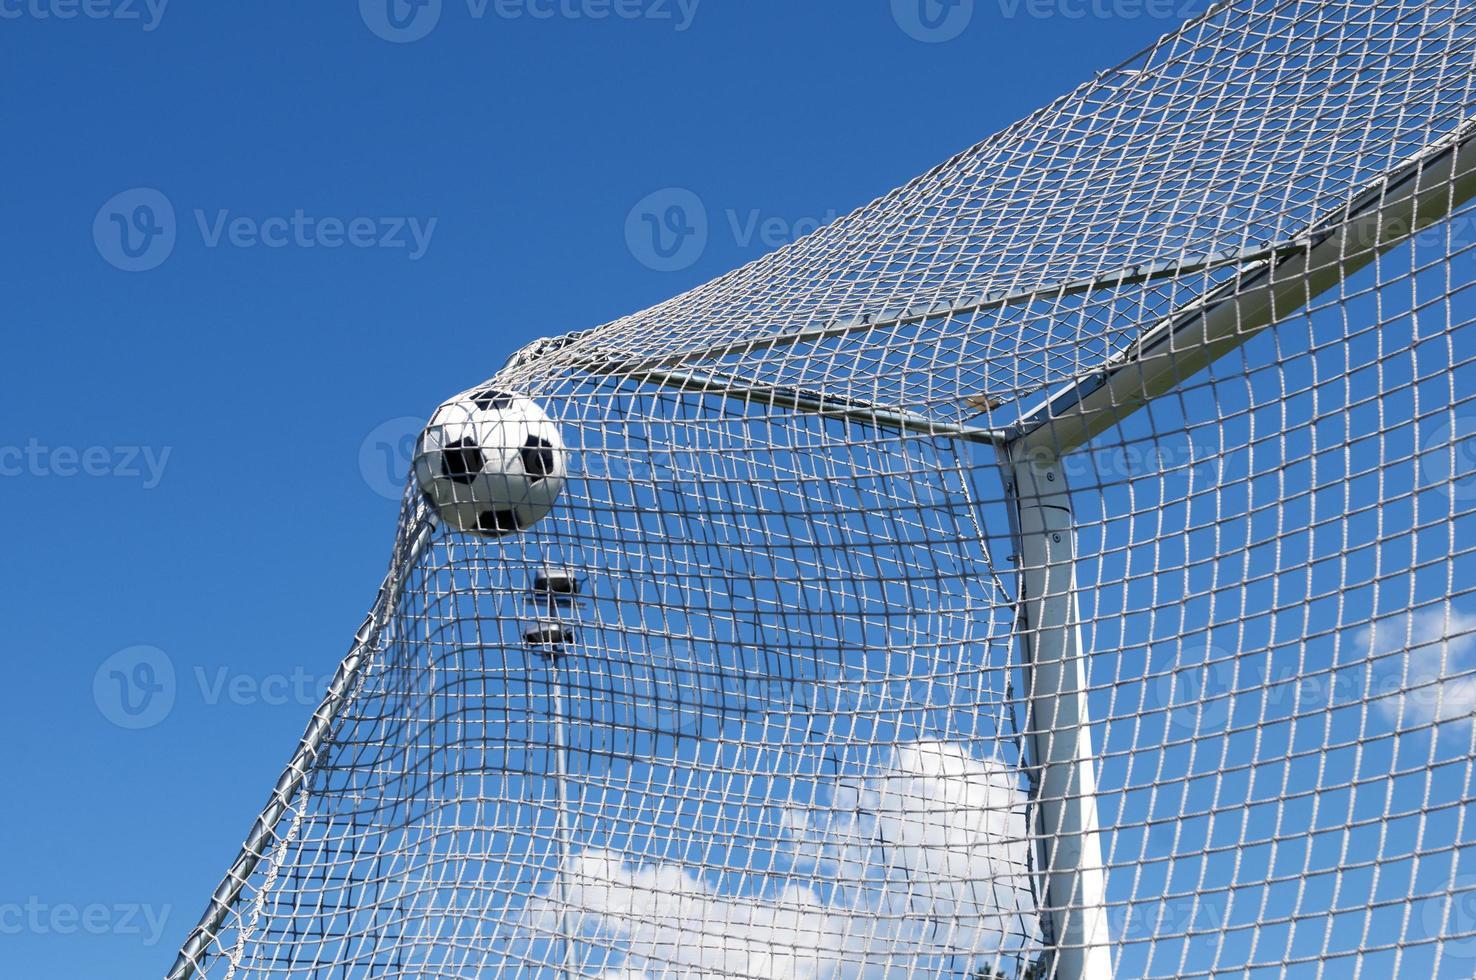 le football fait un grand objectif photo